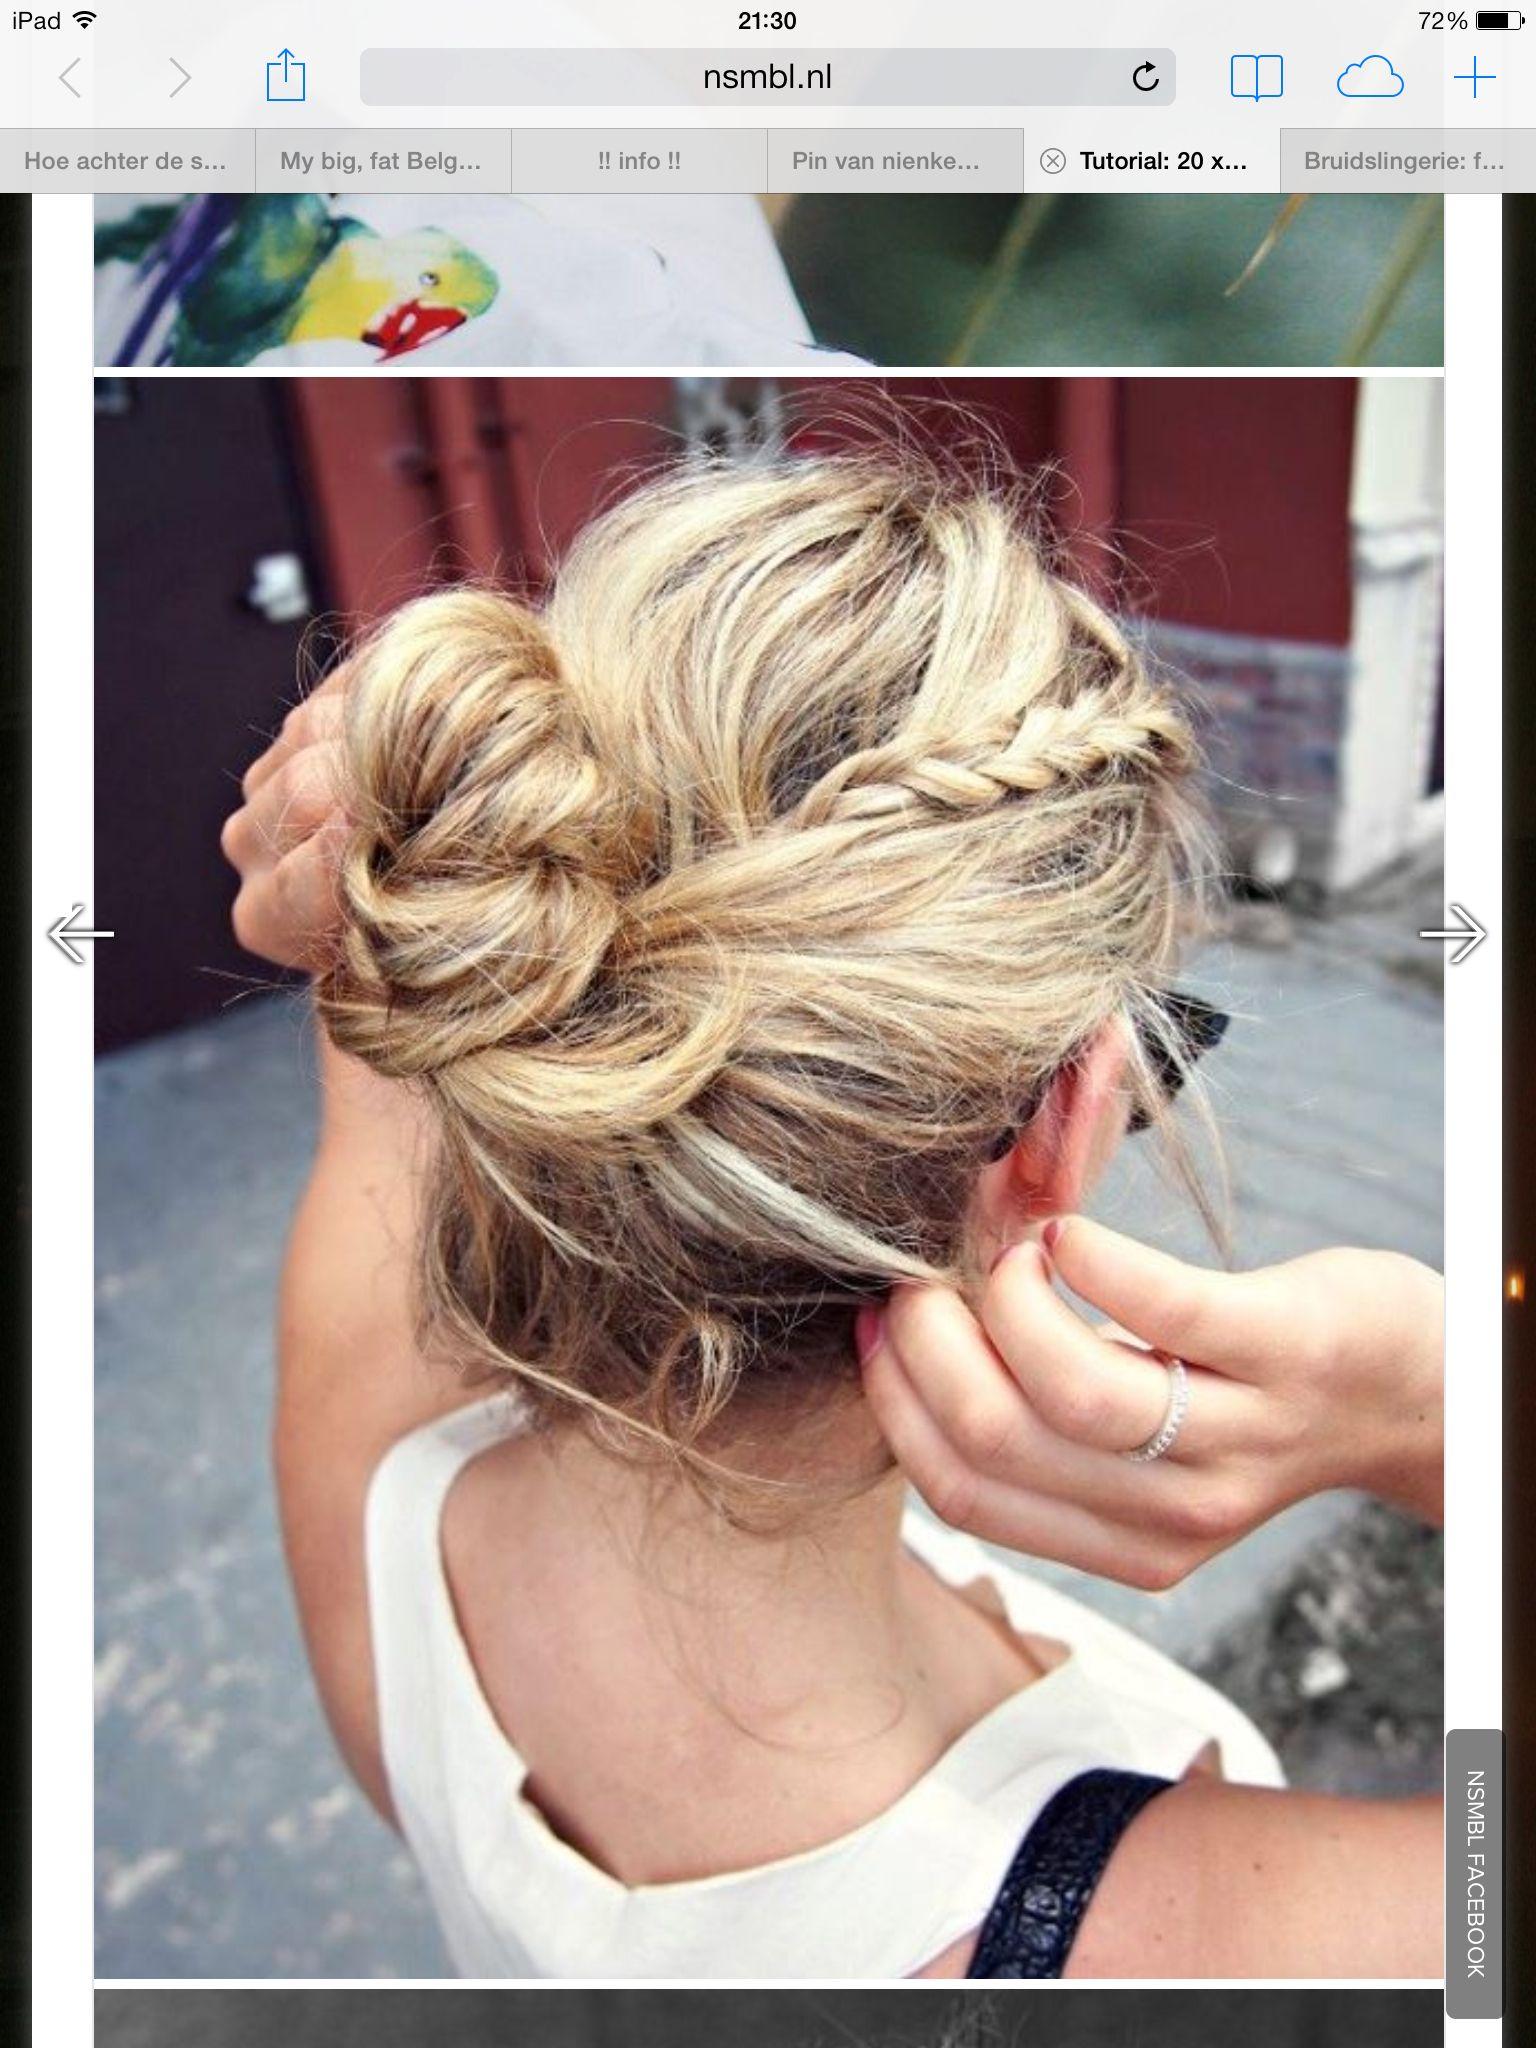 Knot met klein vlechtje beauty pinterest hair hair styles and